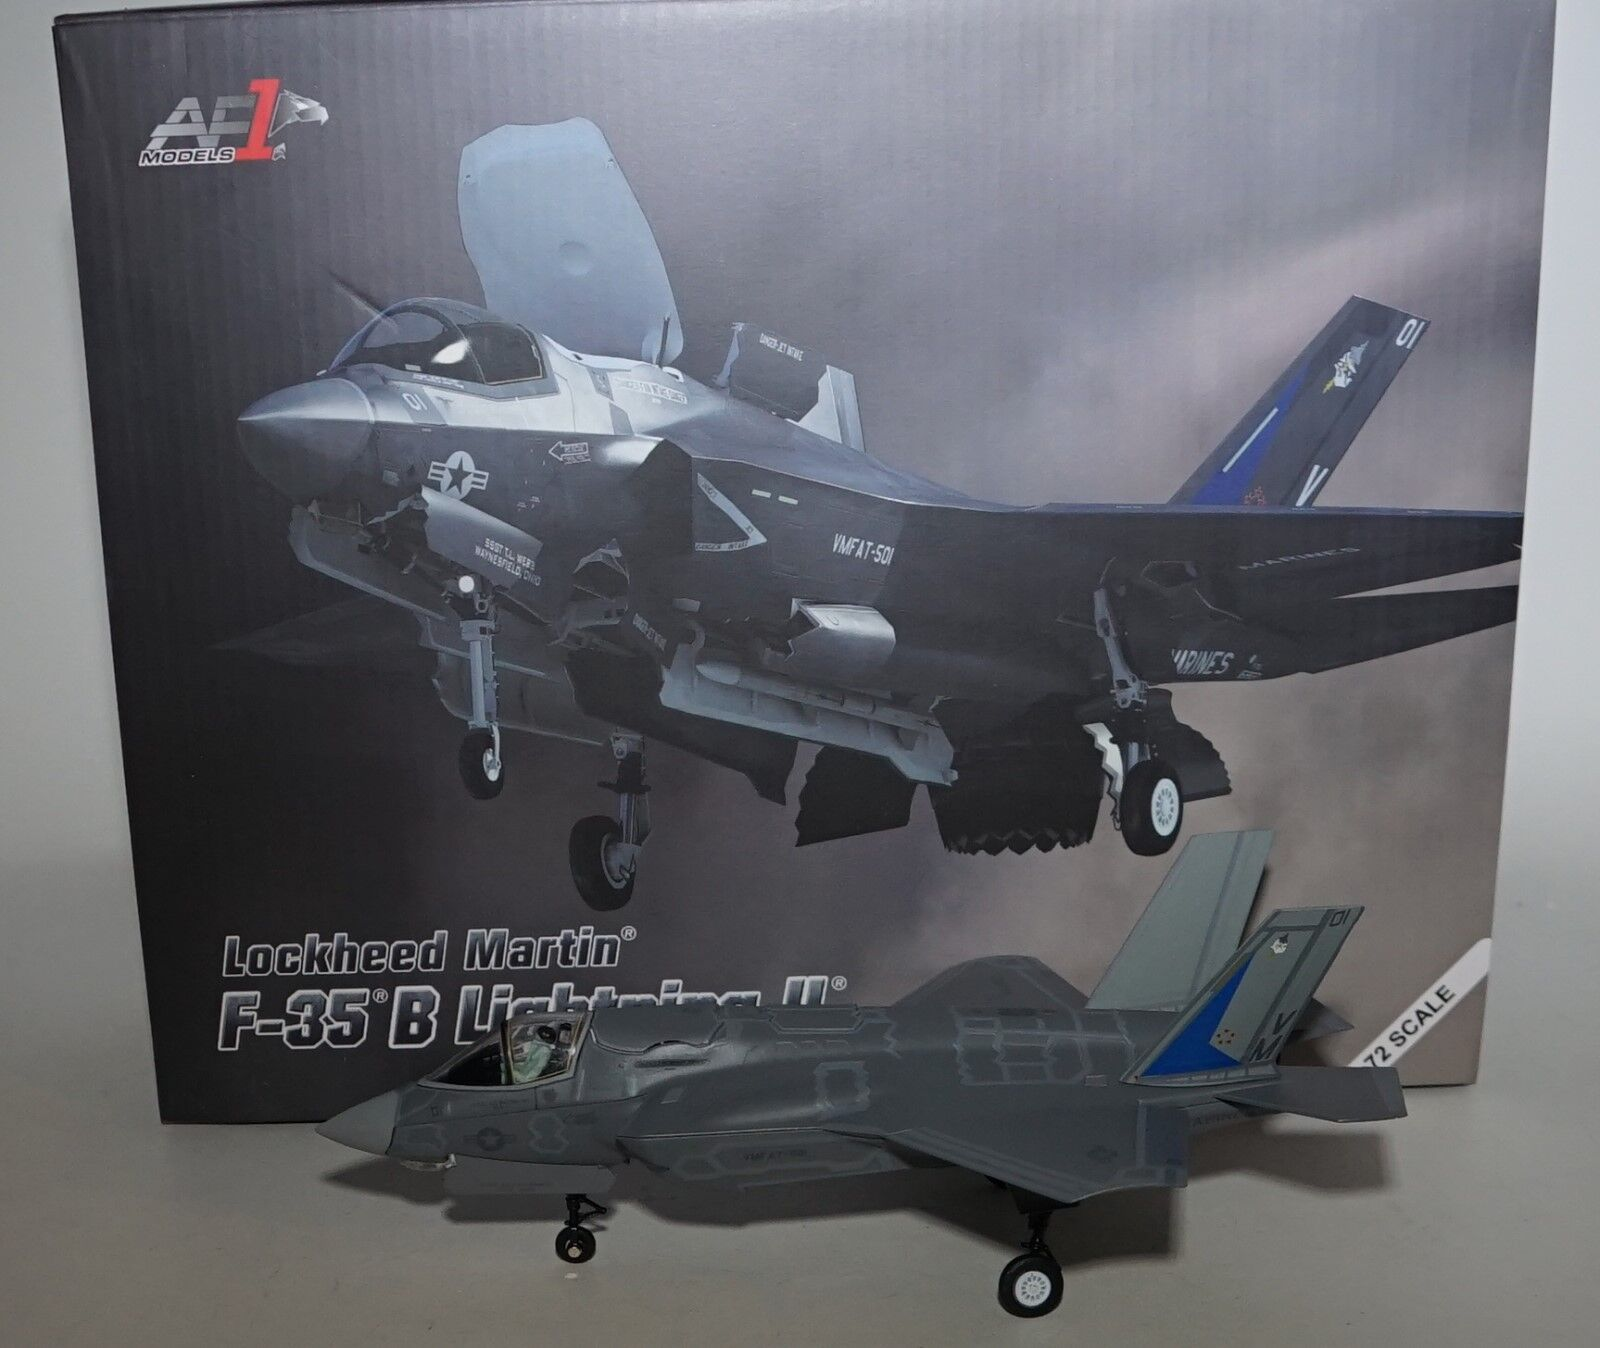 AF1 00009 Schließkopf Martin F-35B Blitz II USMC ,vmfat-501 USAF in 1 72 MAßSTAB